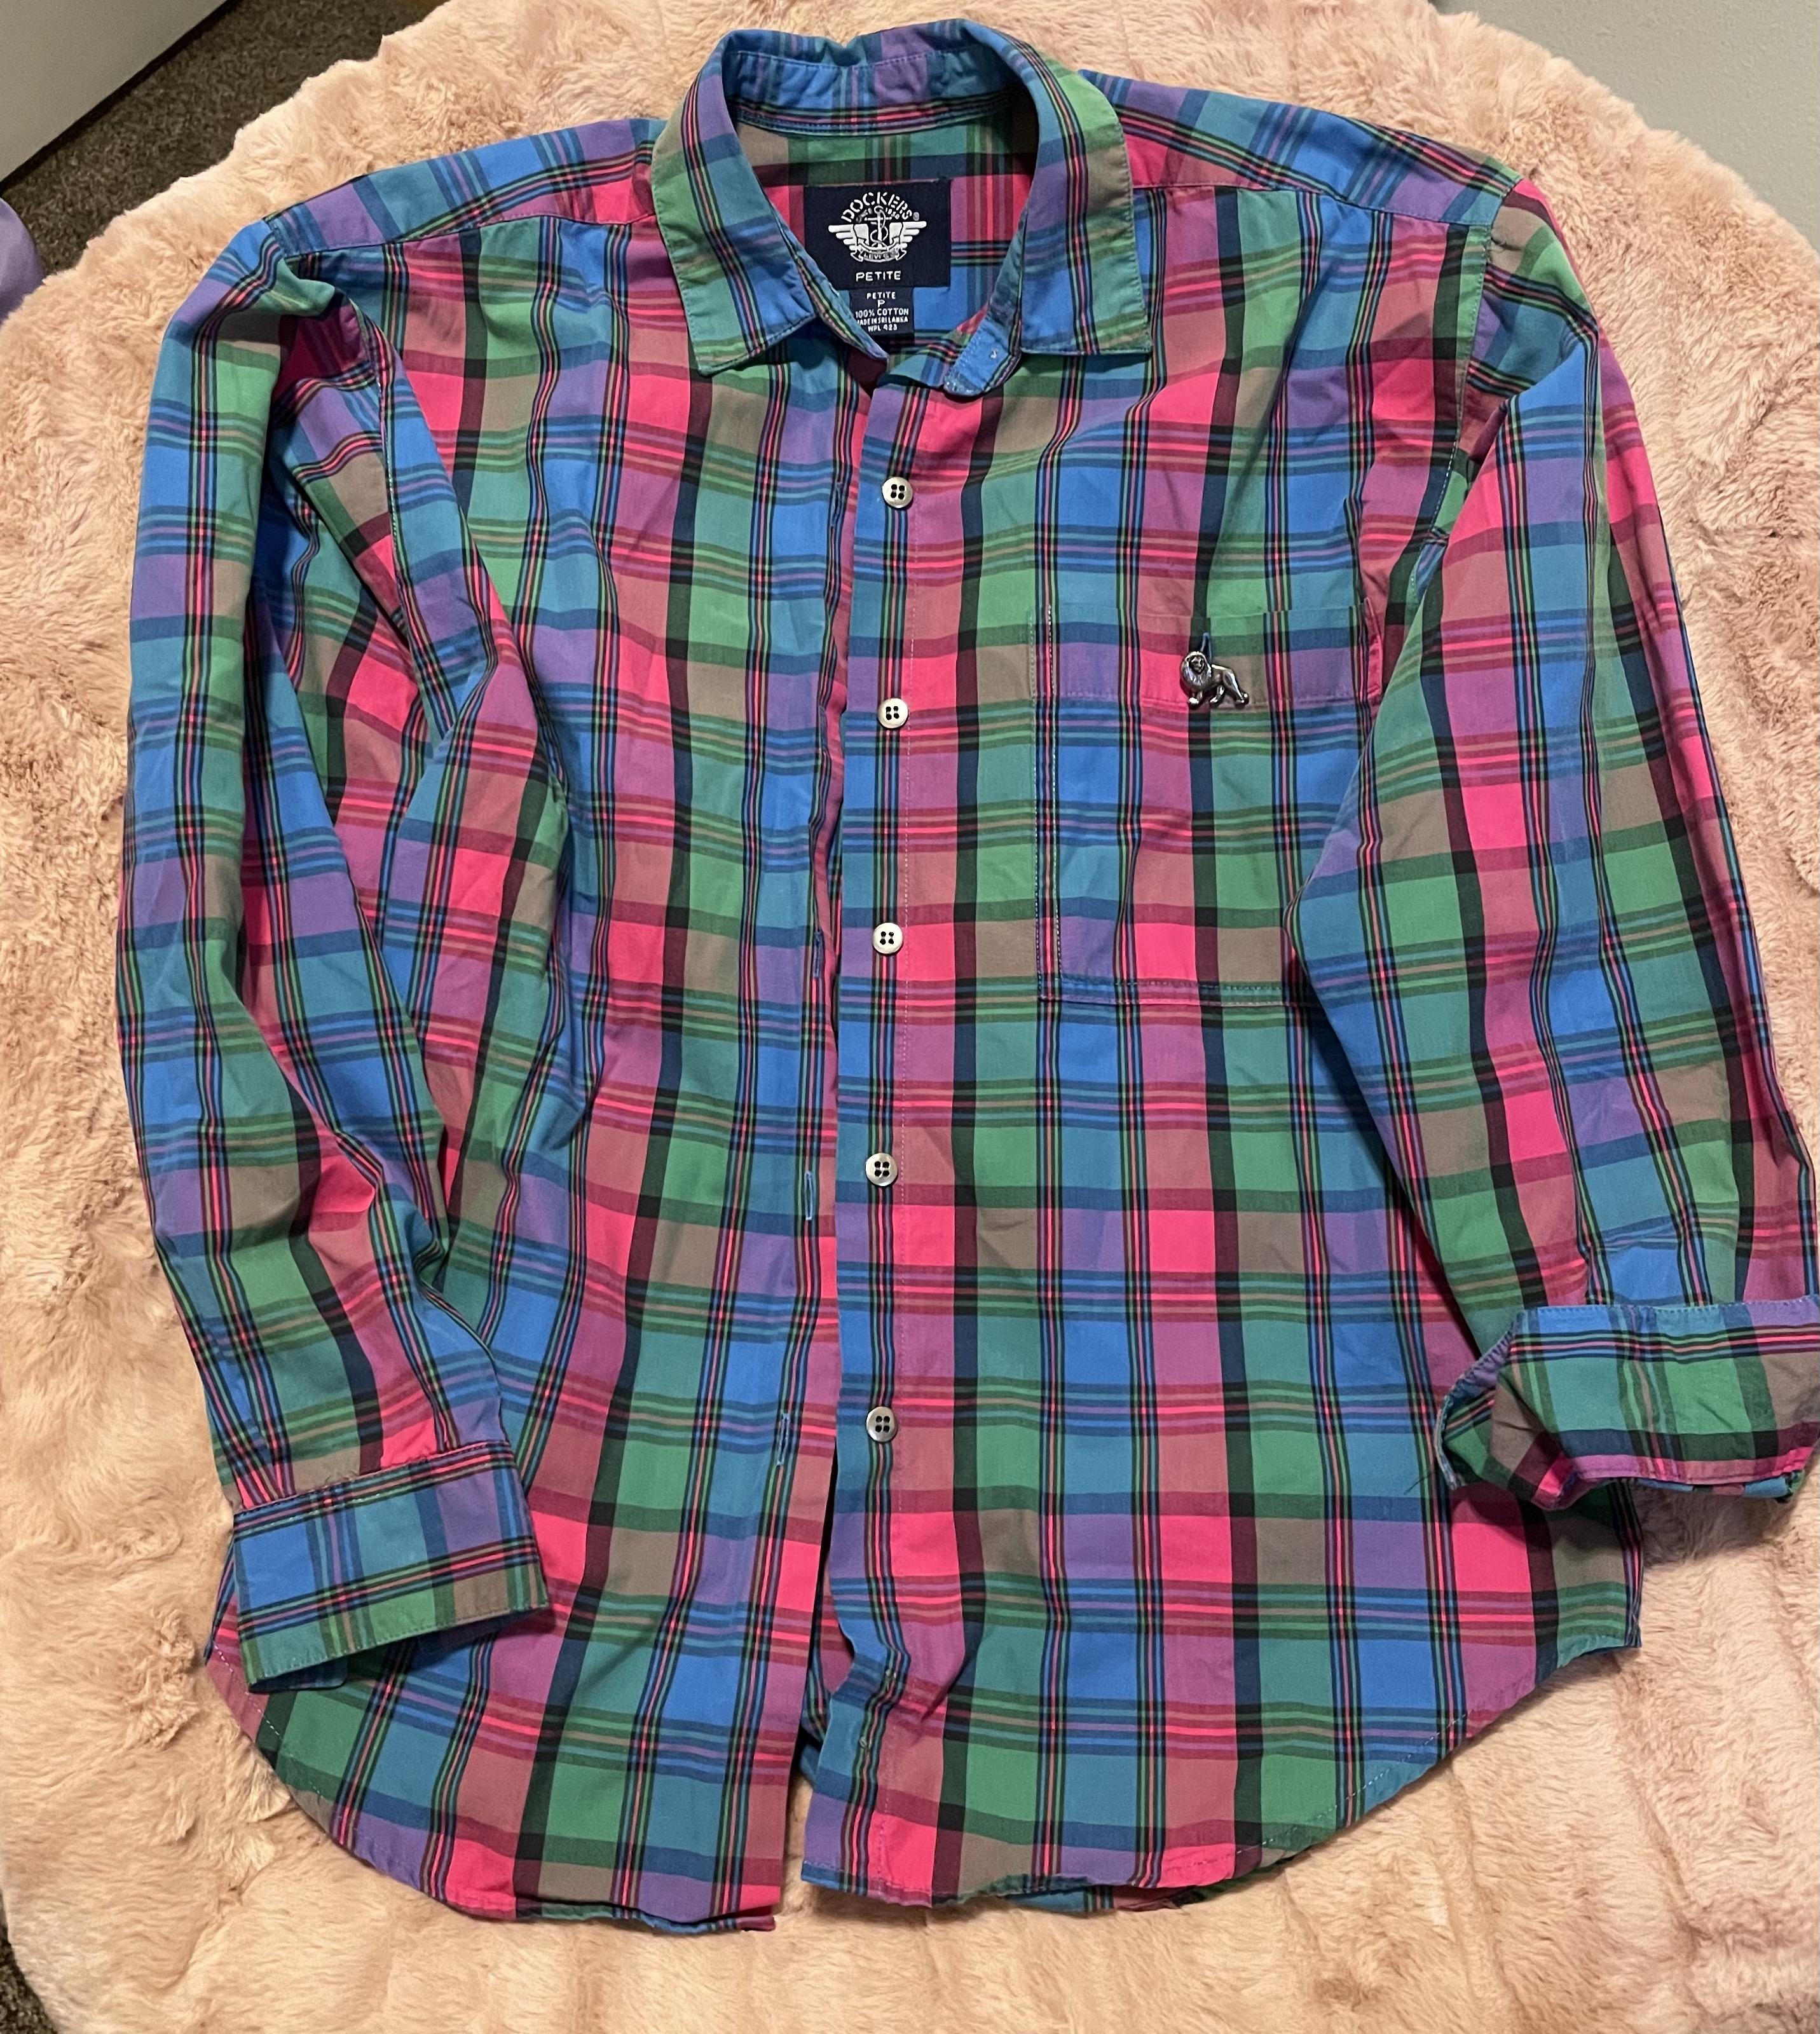 Levi's Dockers Colorful Plaid Long Sleeve Shirt   Pink, Blue, Green Plaid   Metal Lion Button Detail   Women's Size Petite